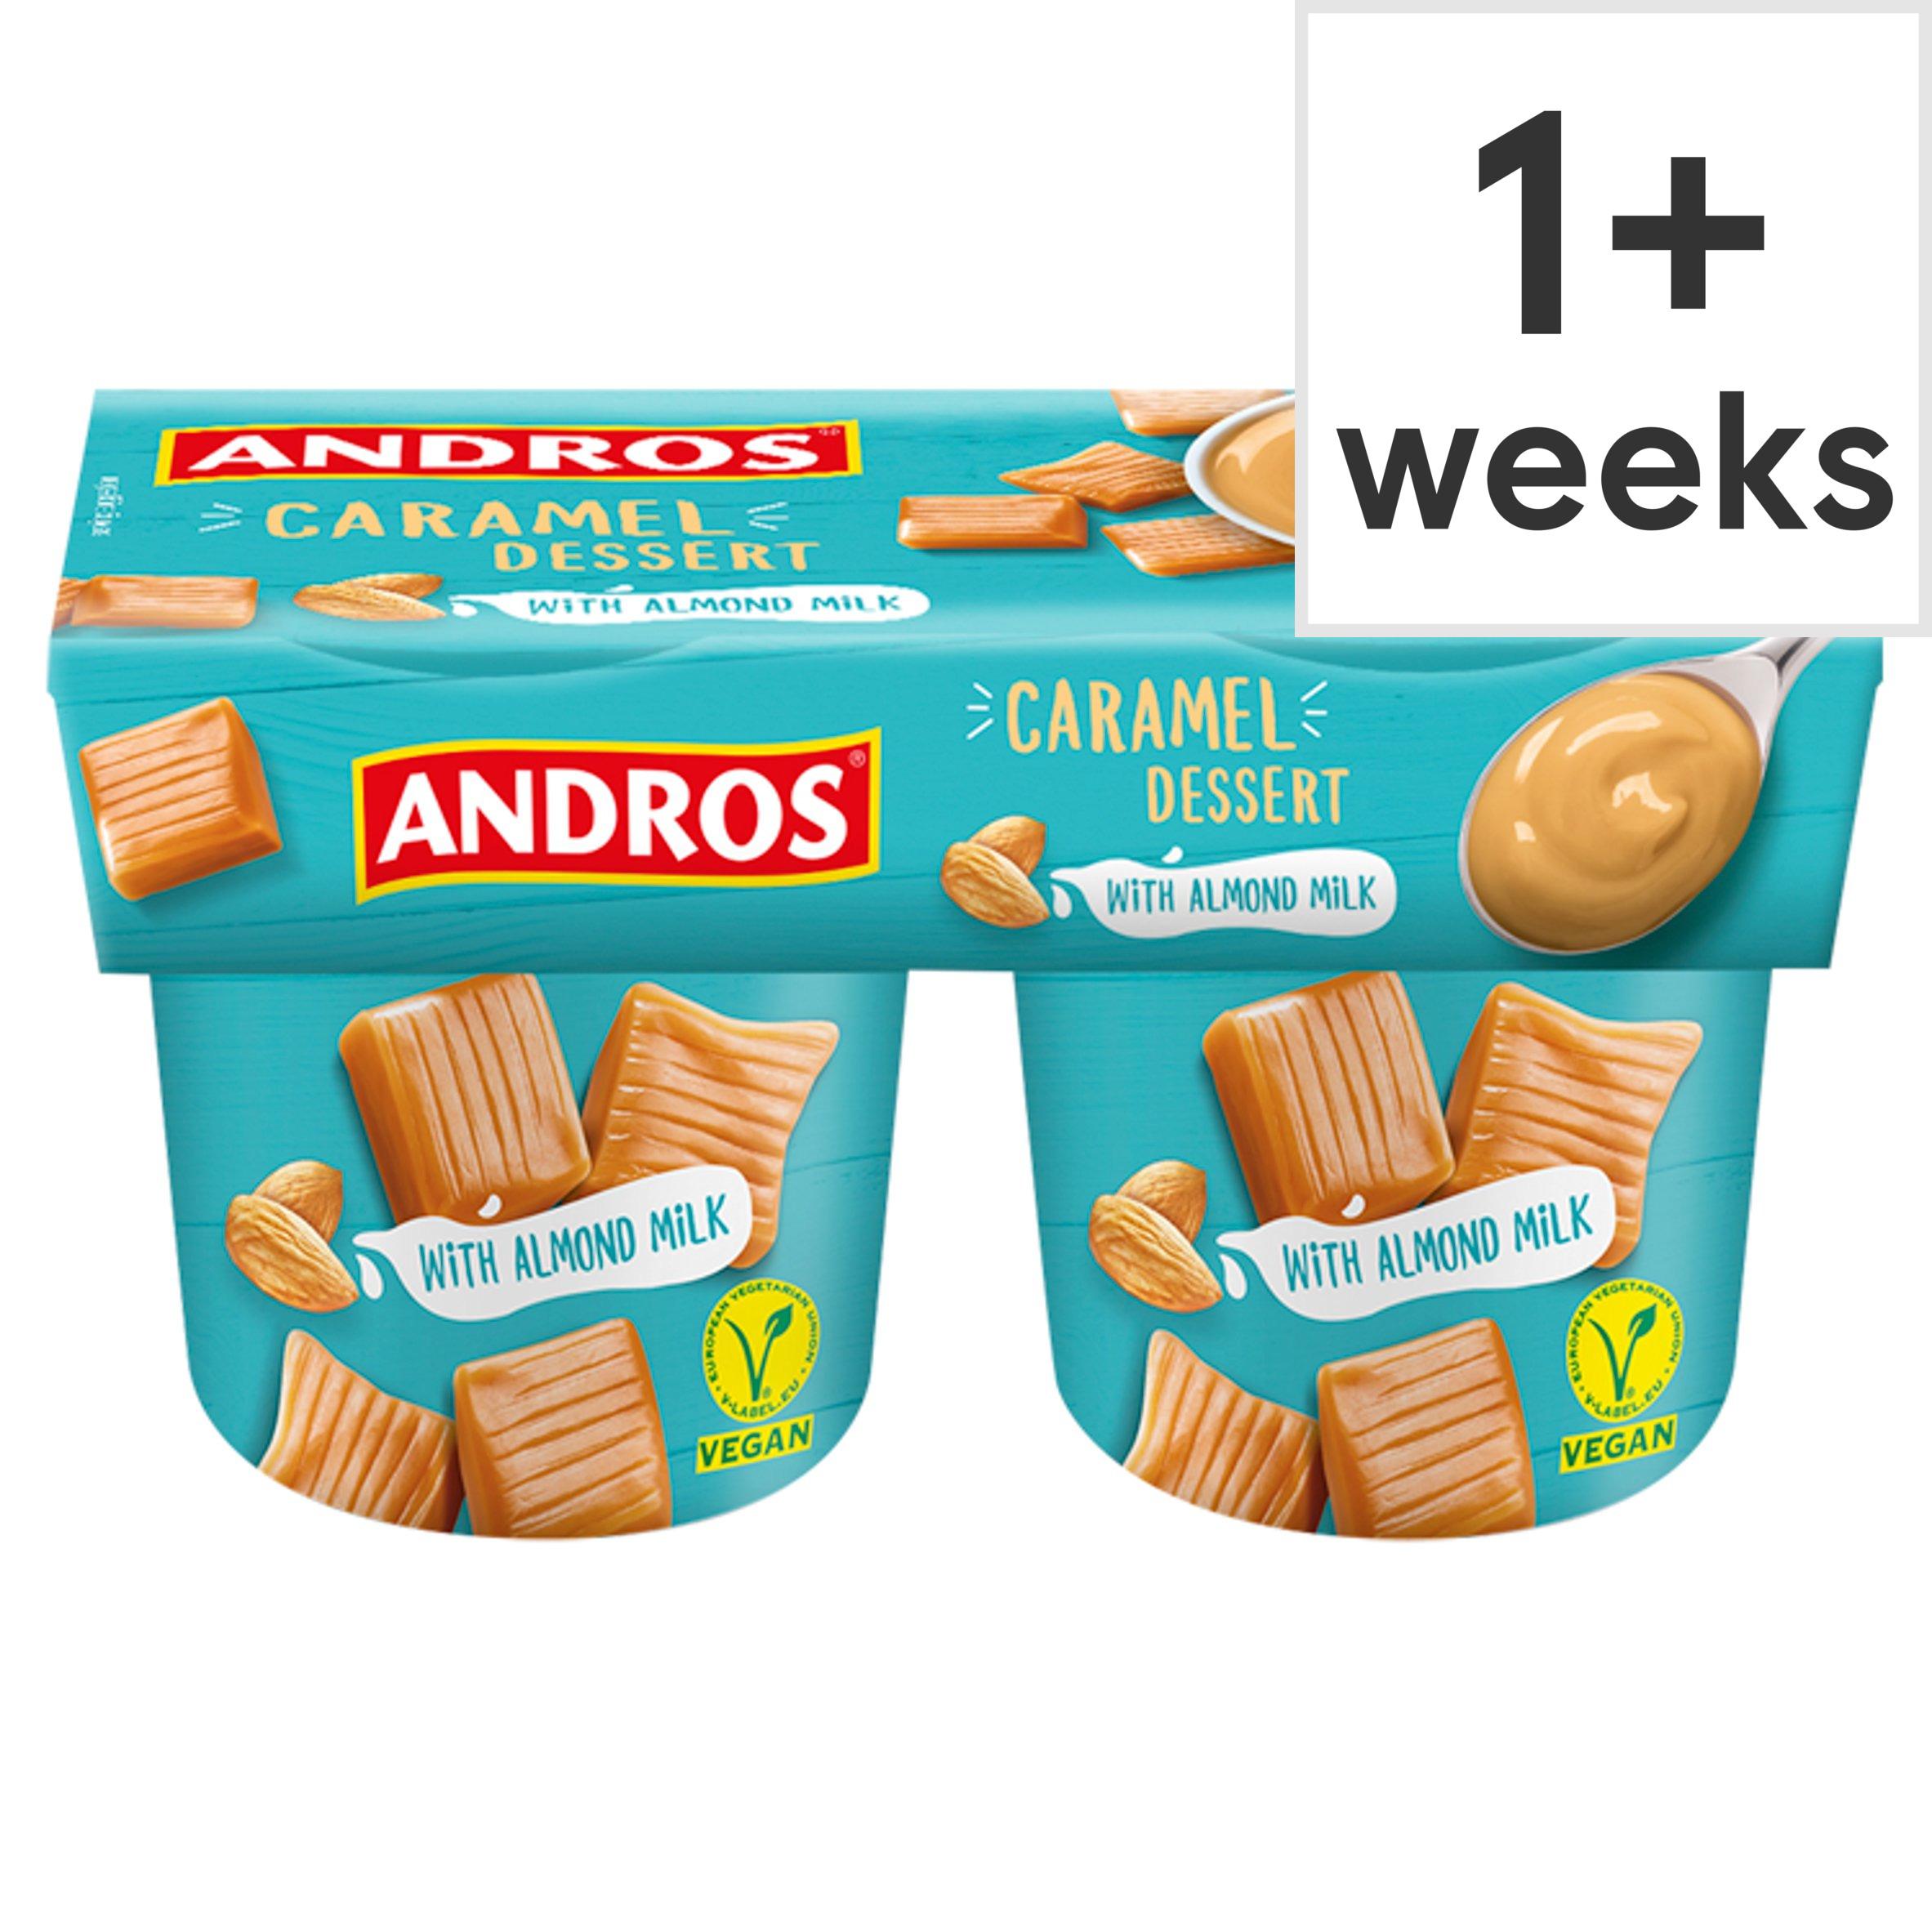 Andros Caramel Dessert With Almond Milk 2 X 120G